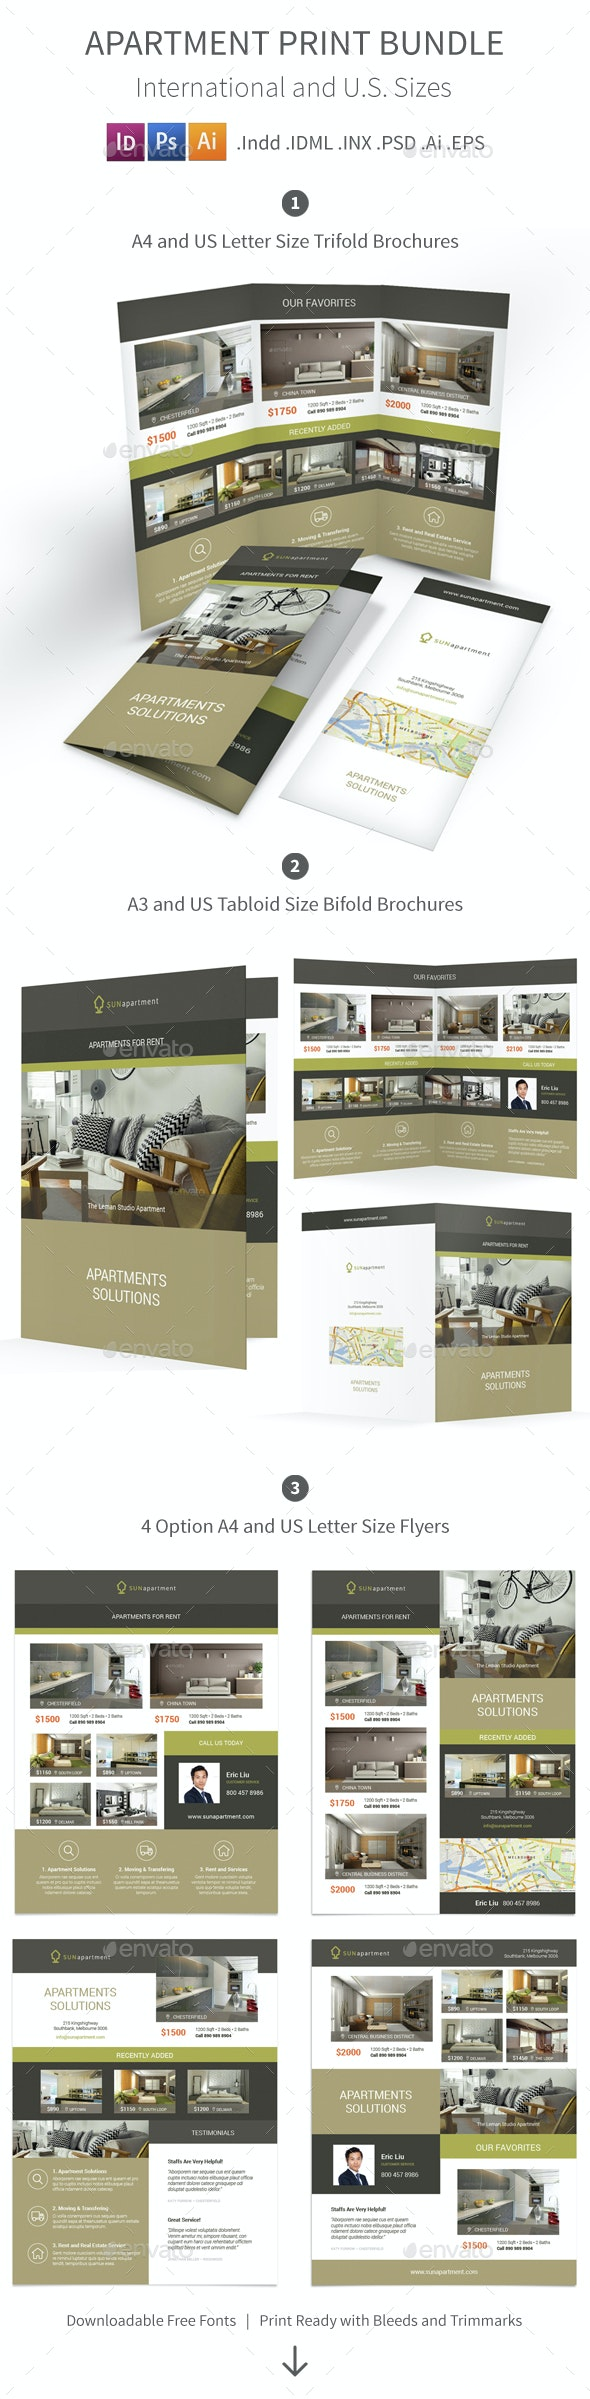 Apartment For Rent Print Bundle 2 - Informational Brochures